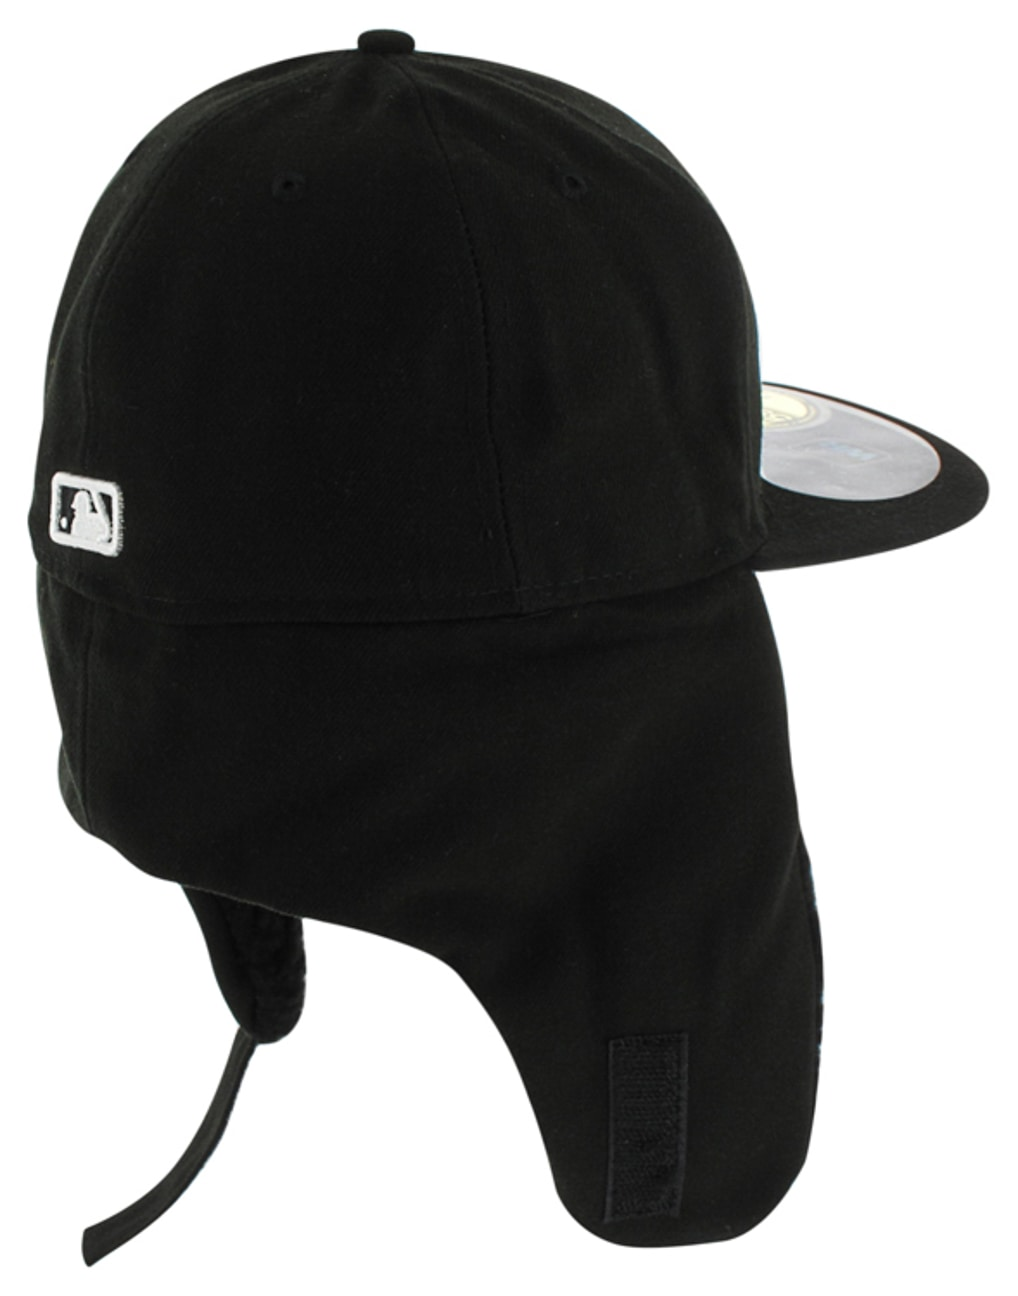 59Fifty Dog Ear Baseball Cap by New Era 1 ... 930c69559d14